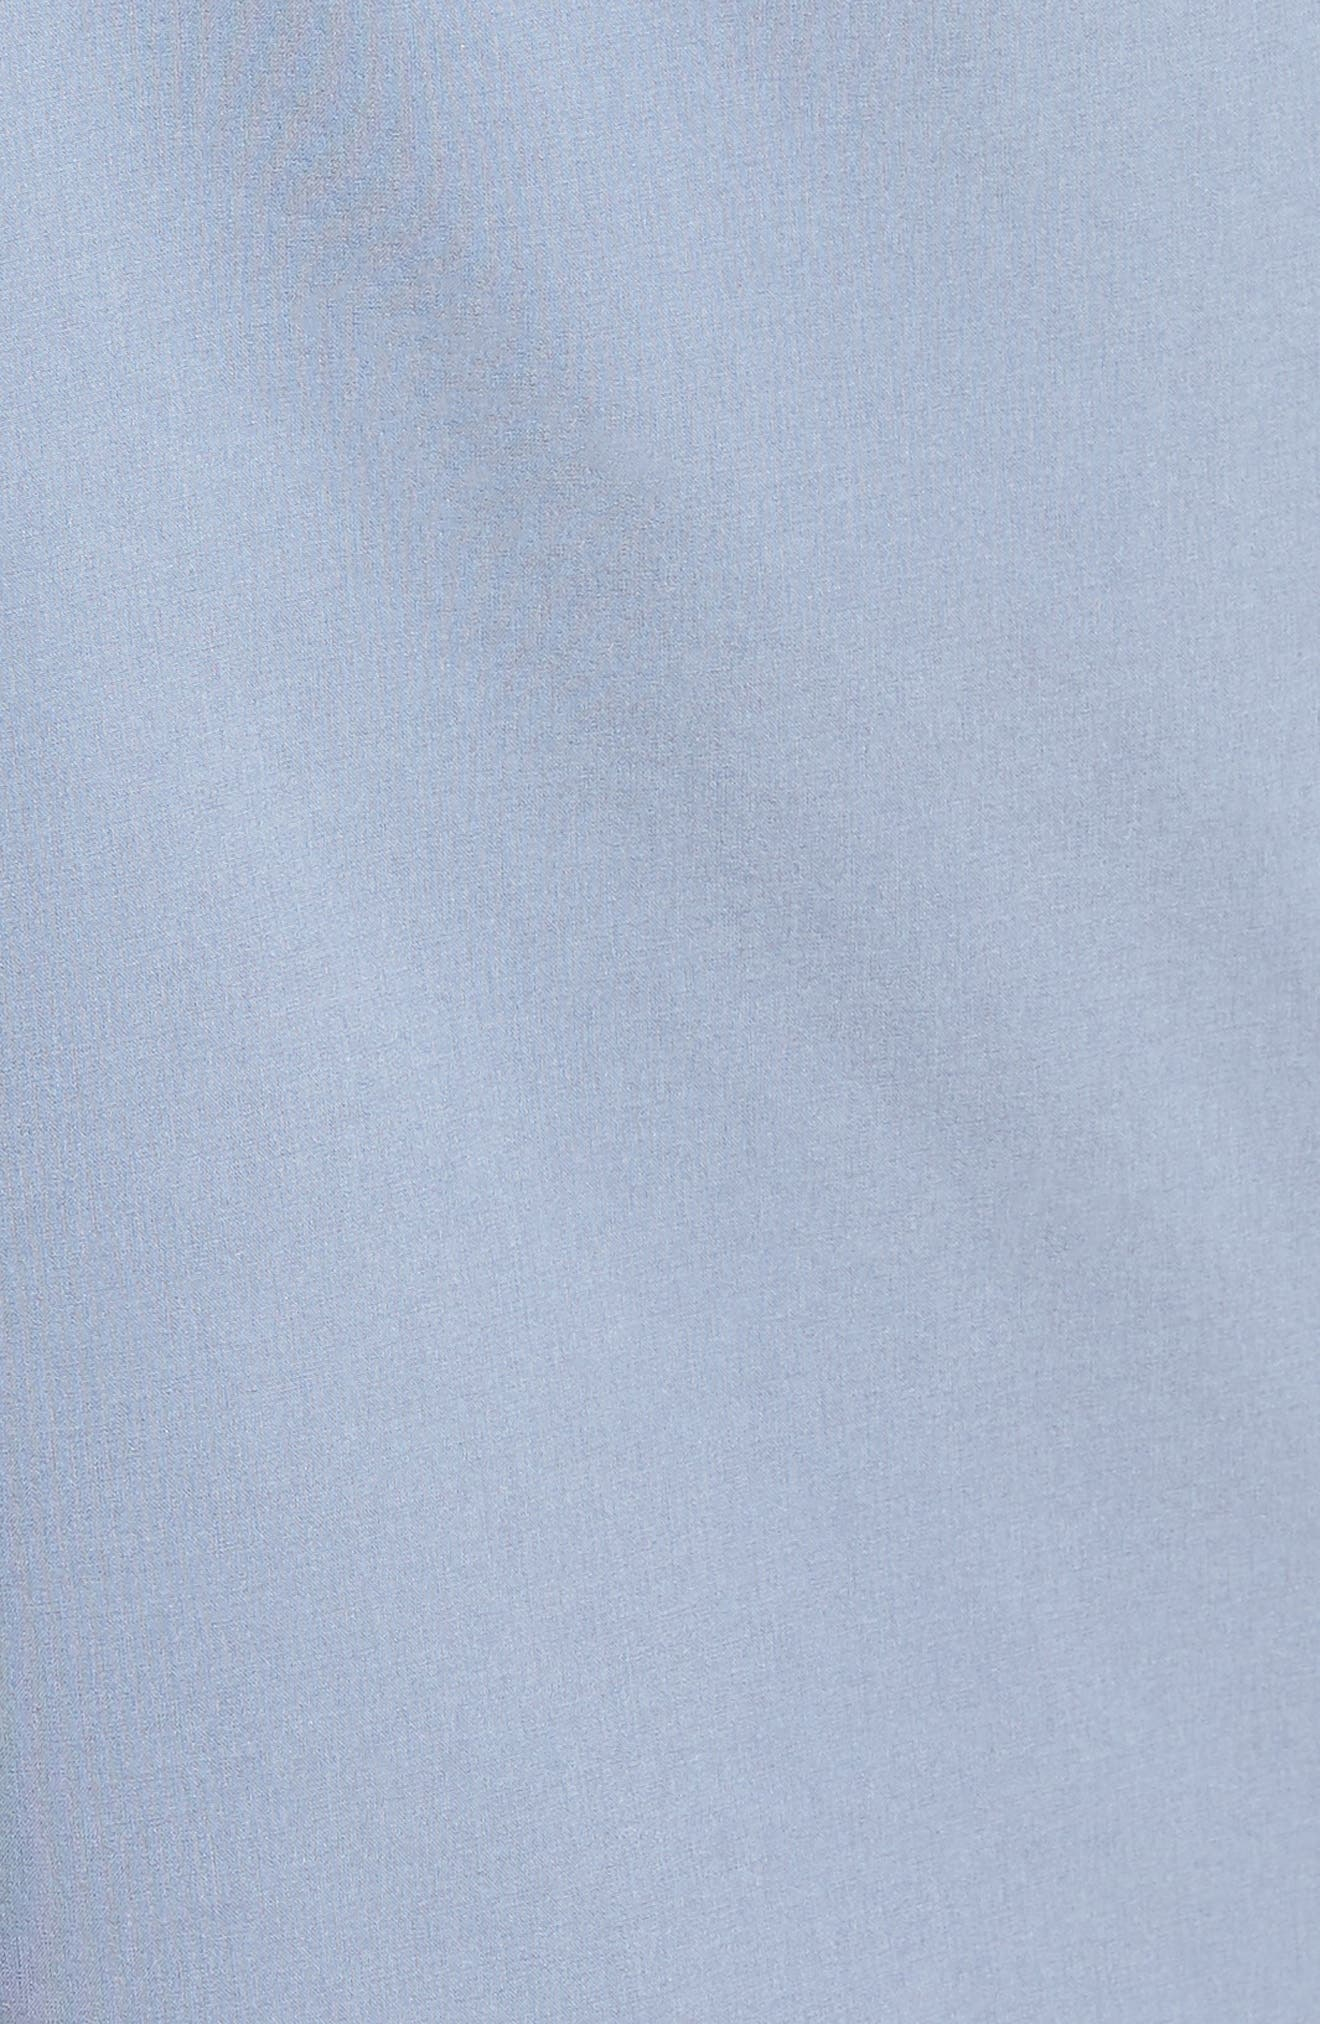 8 Inch Performance Breaker Shorts,                             Alternate thumbnail 5, color,                             423